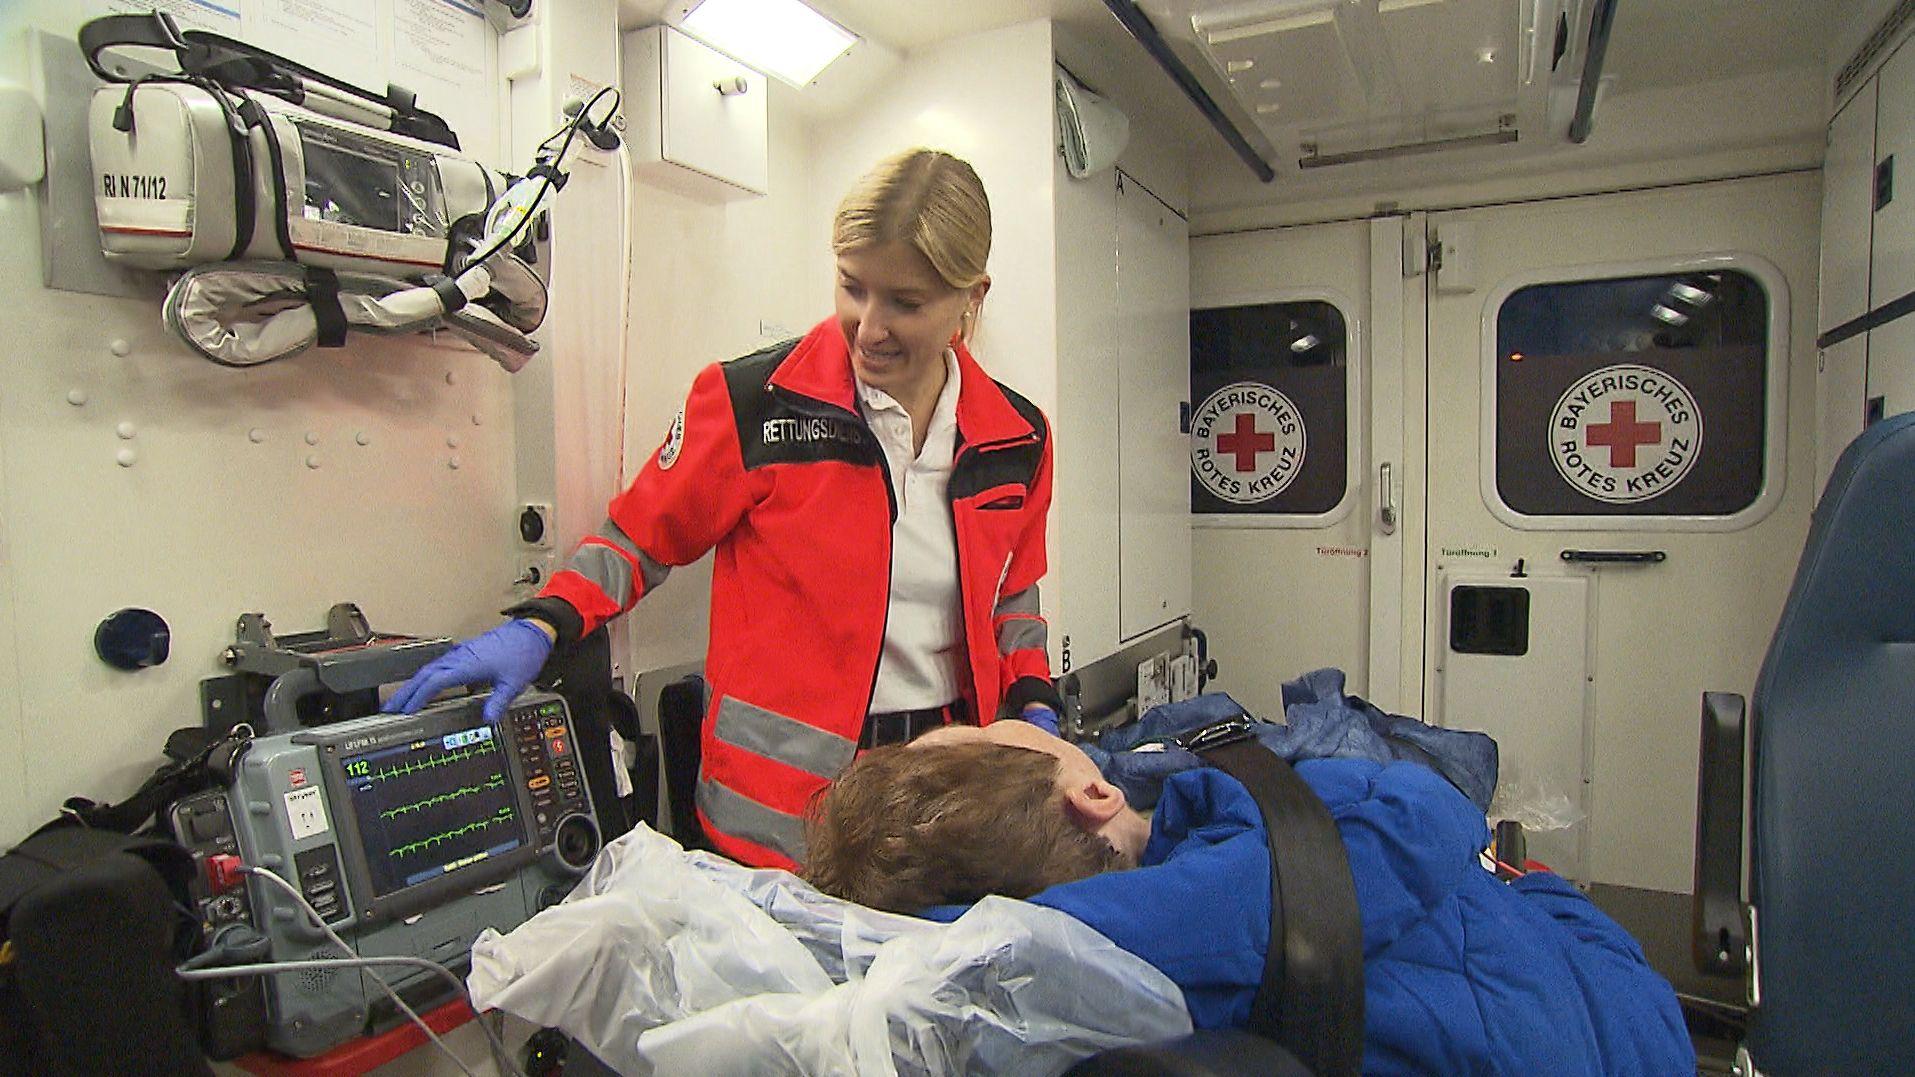 Nürnberg: BRK-Notfallsanitäterin im Einsatz